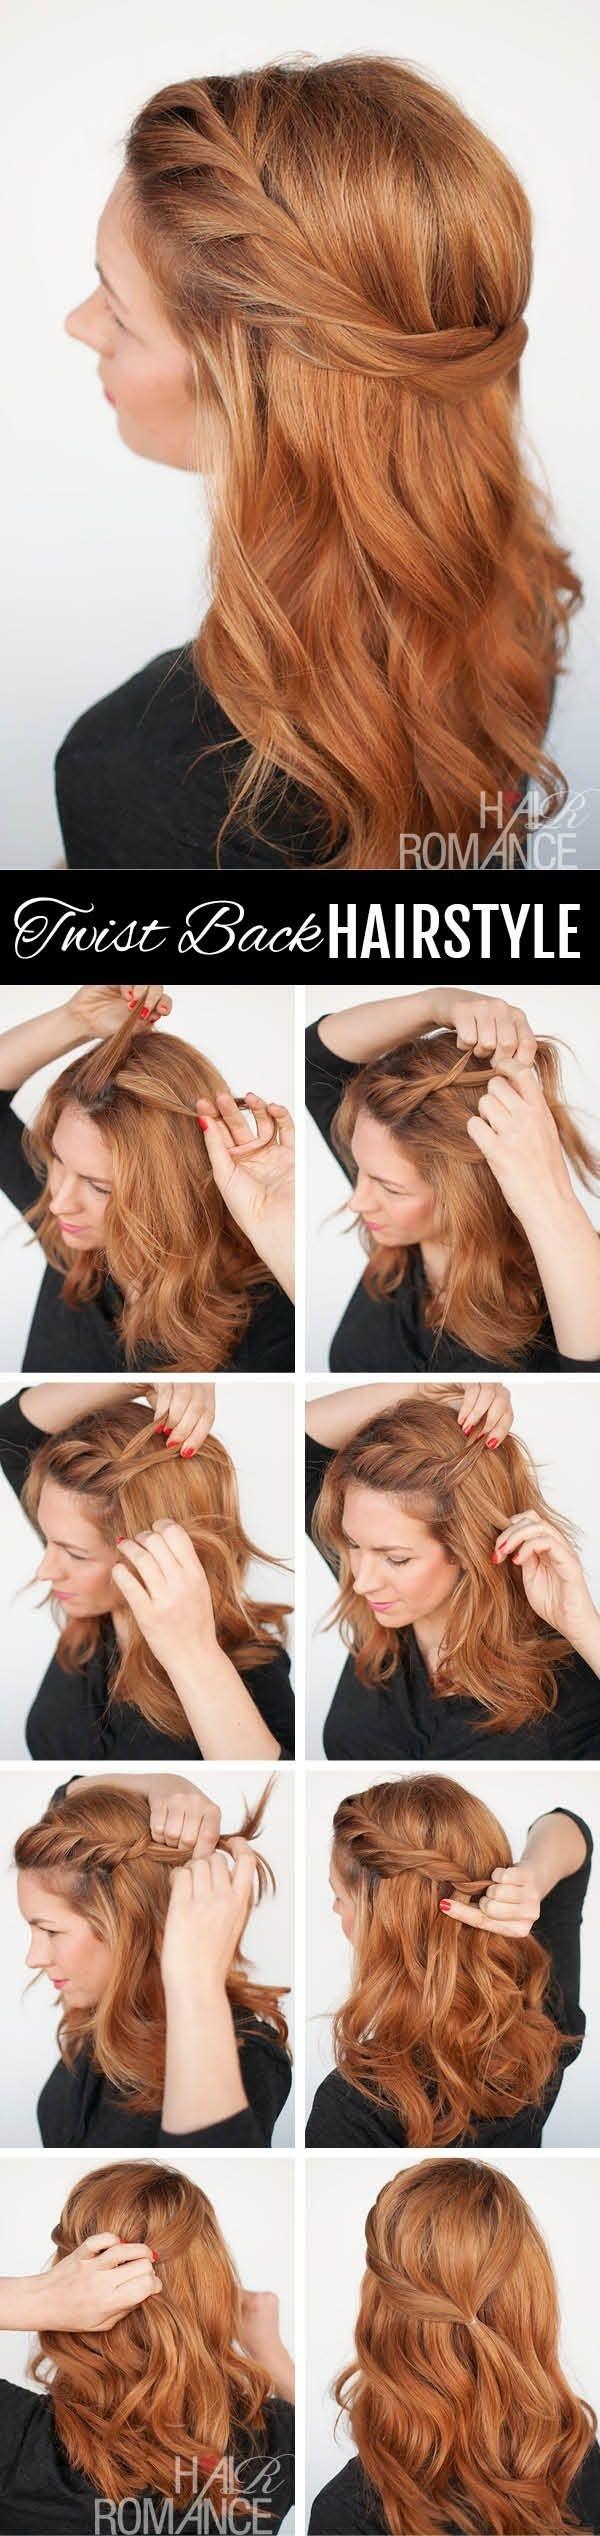 Fantastic 17 Gorgeous Hairstyles For Lazy Girls Hair Short Hairstyles For Black Women Fulllsitofus